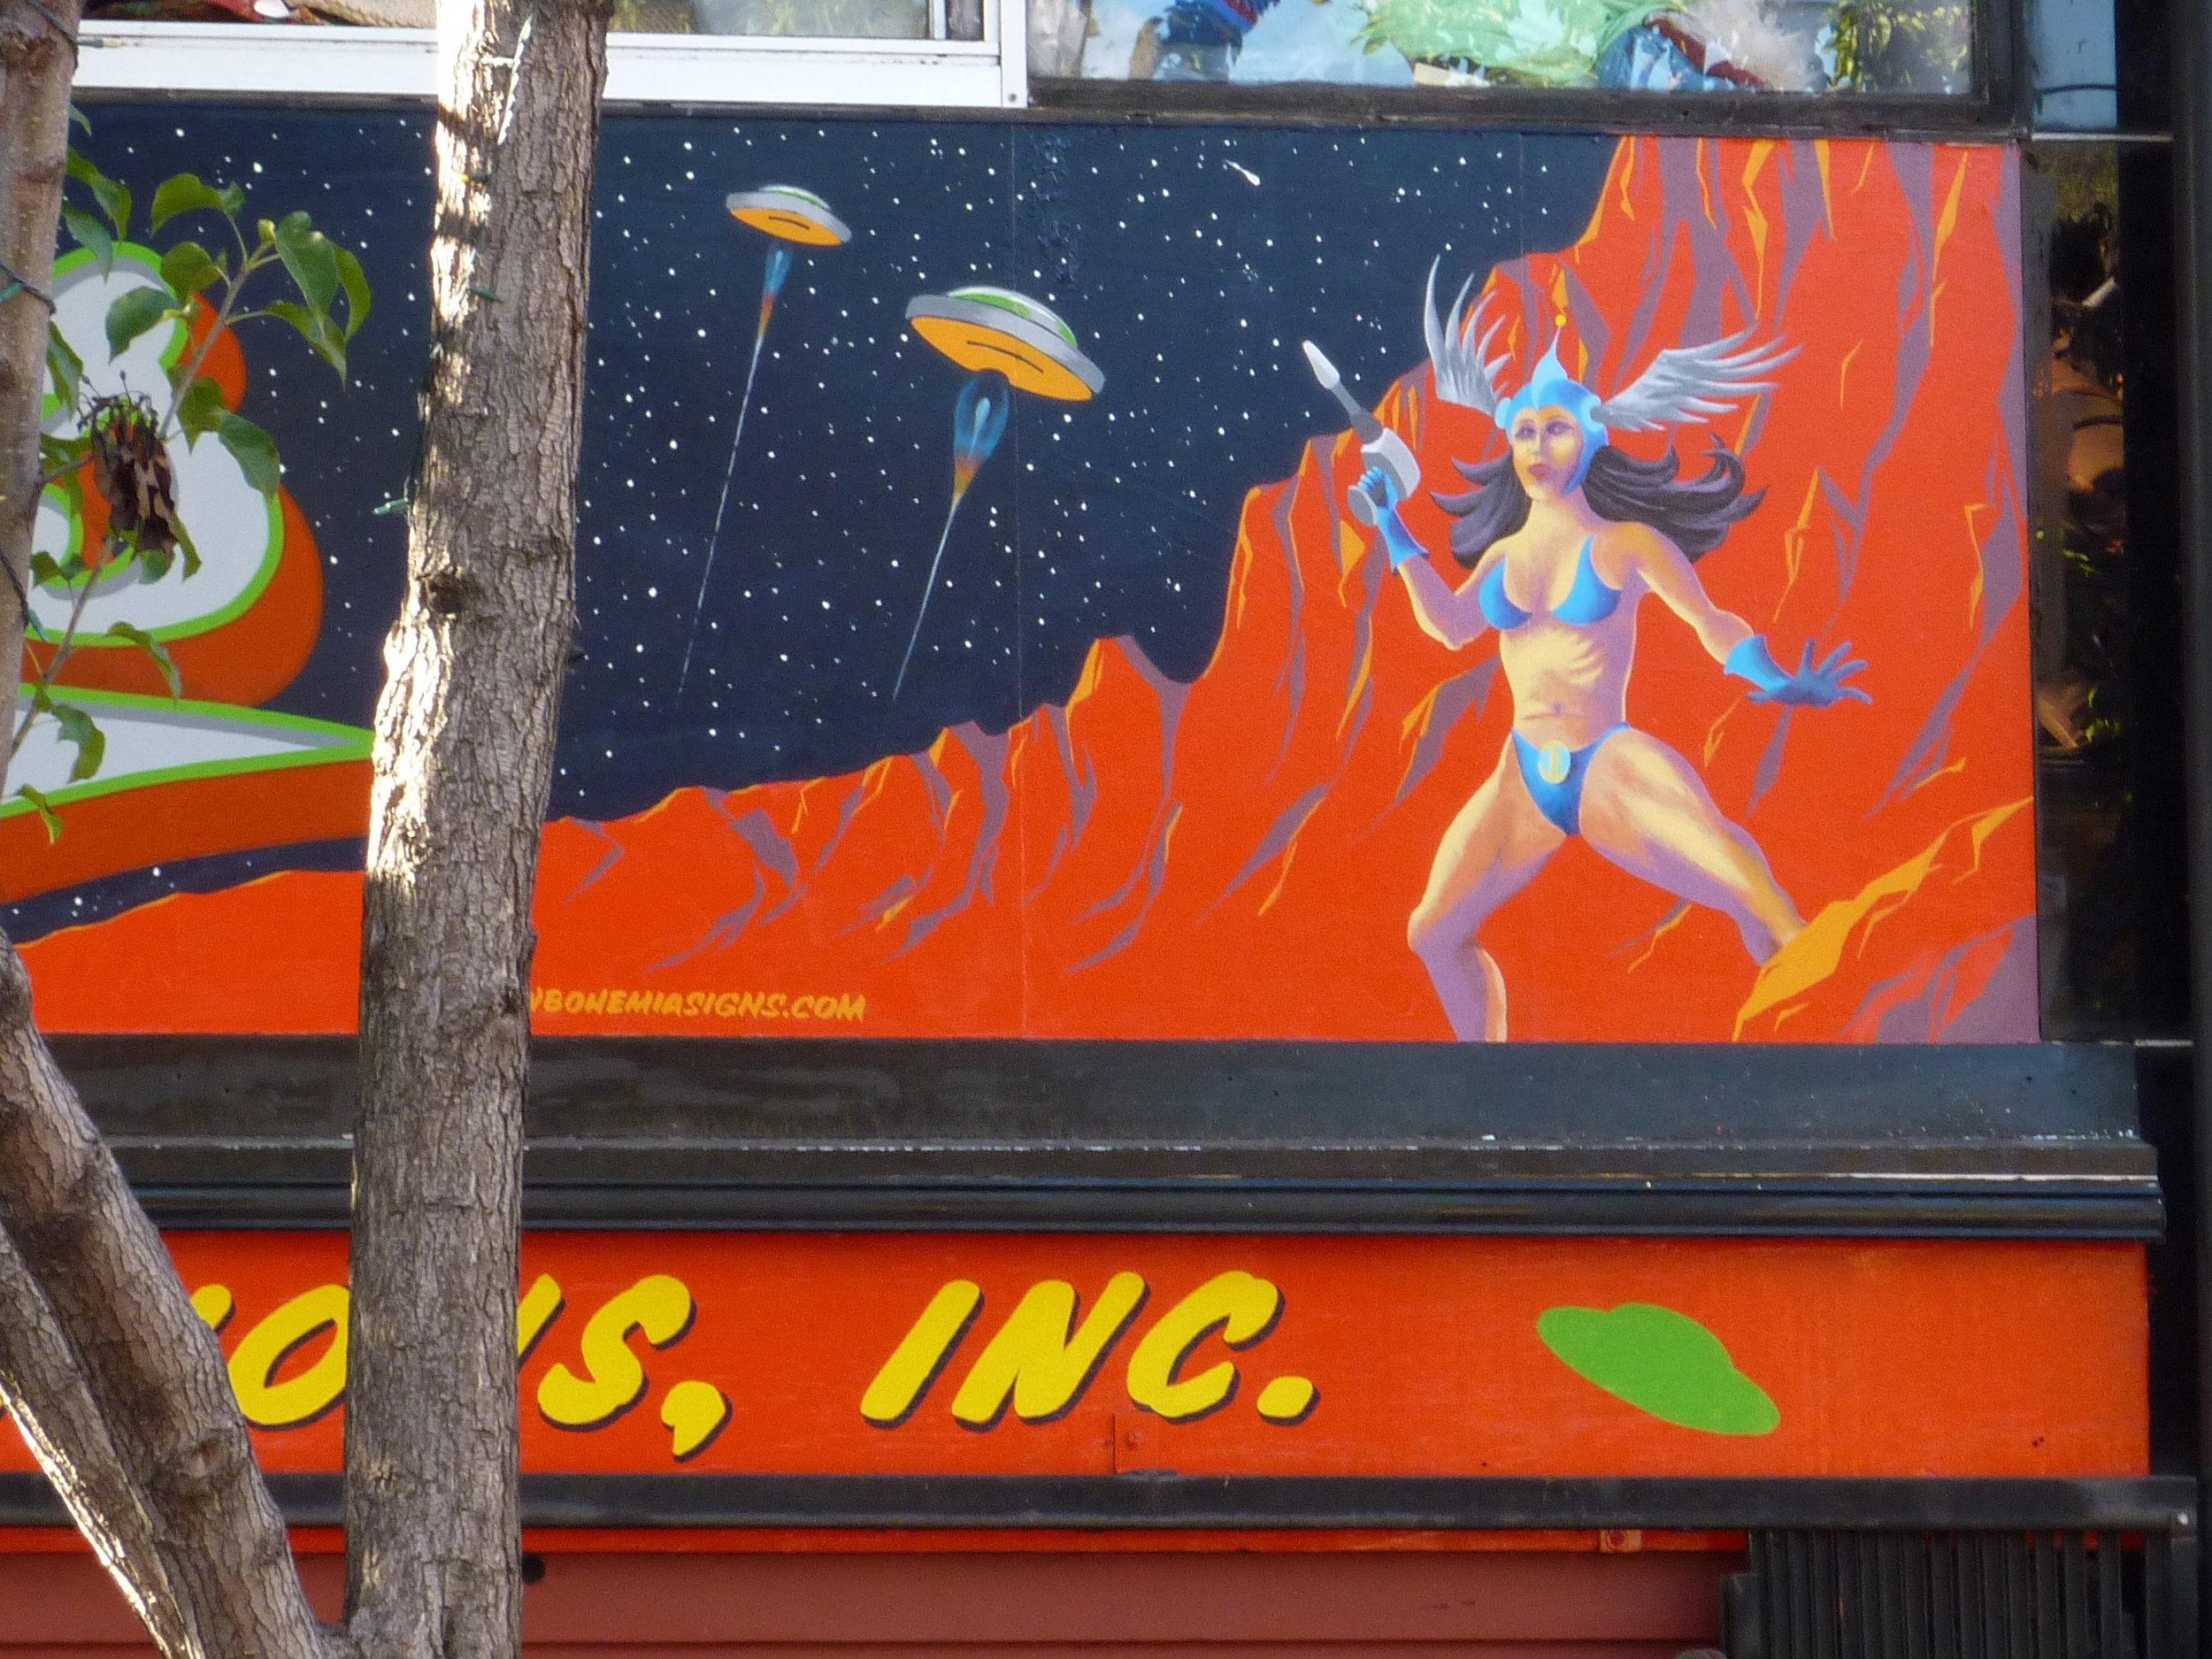 ORIG-mars-storefront-warrior-babe-and-flying-saucers-detail_4307287066_o.jpg